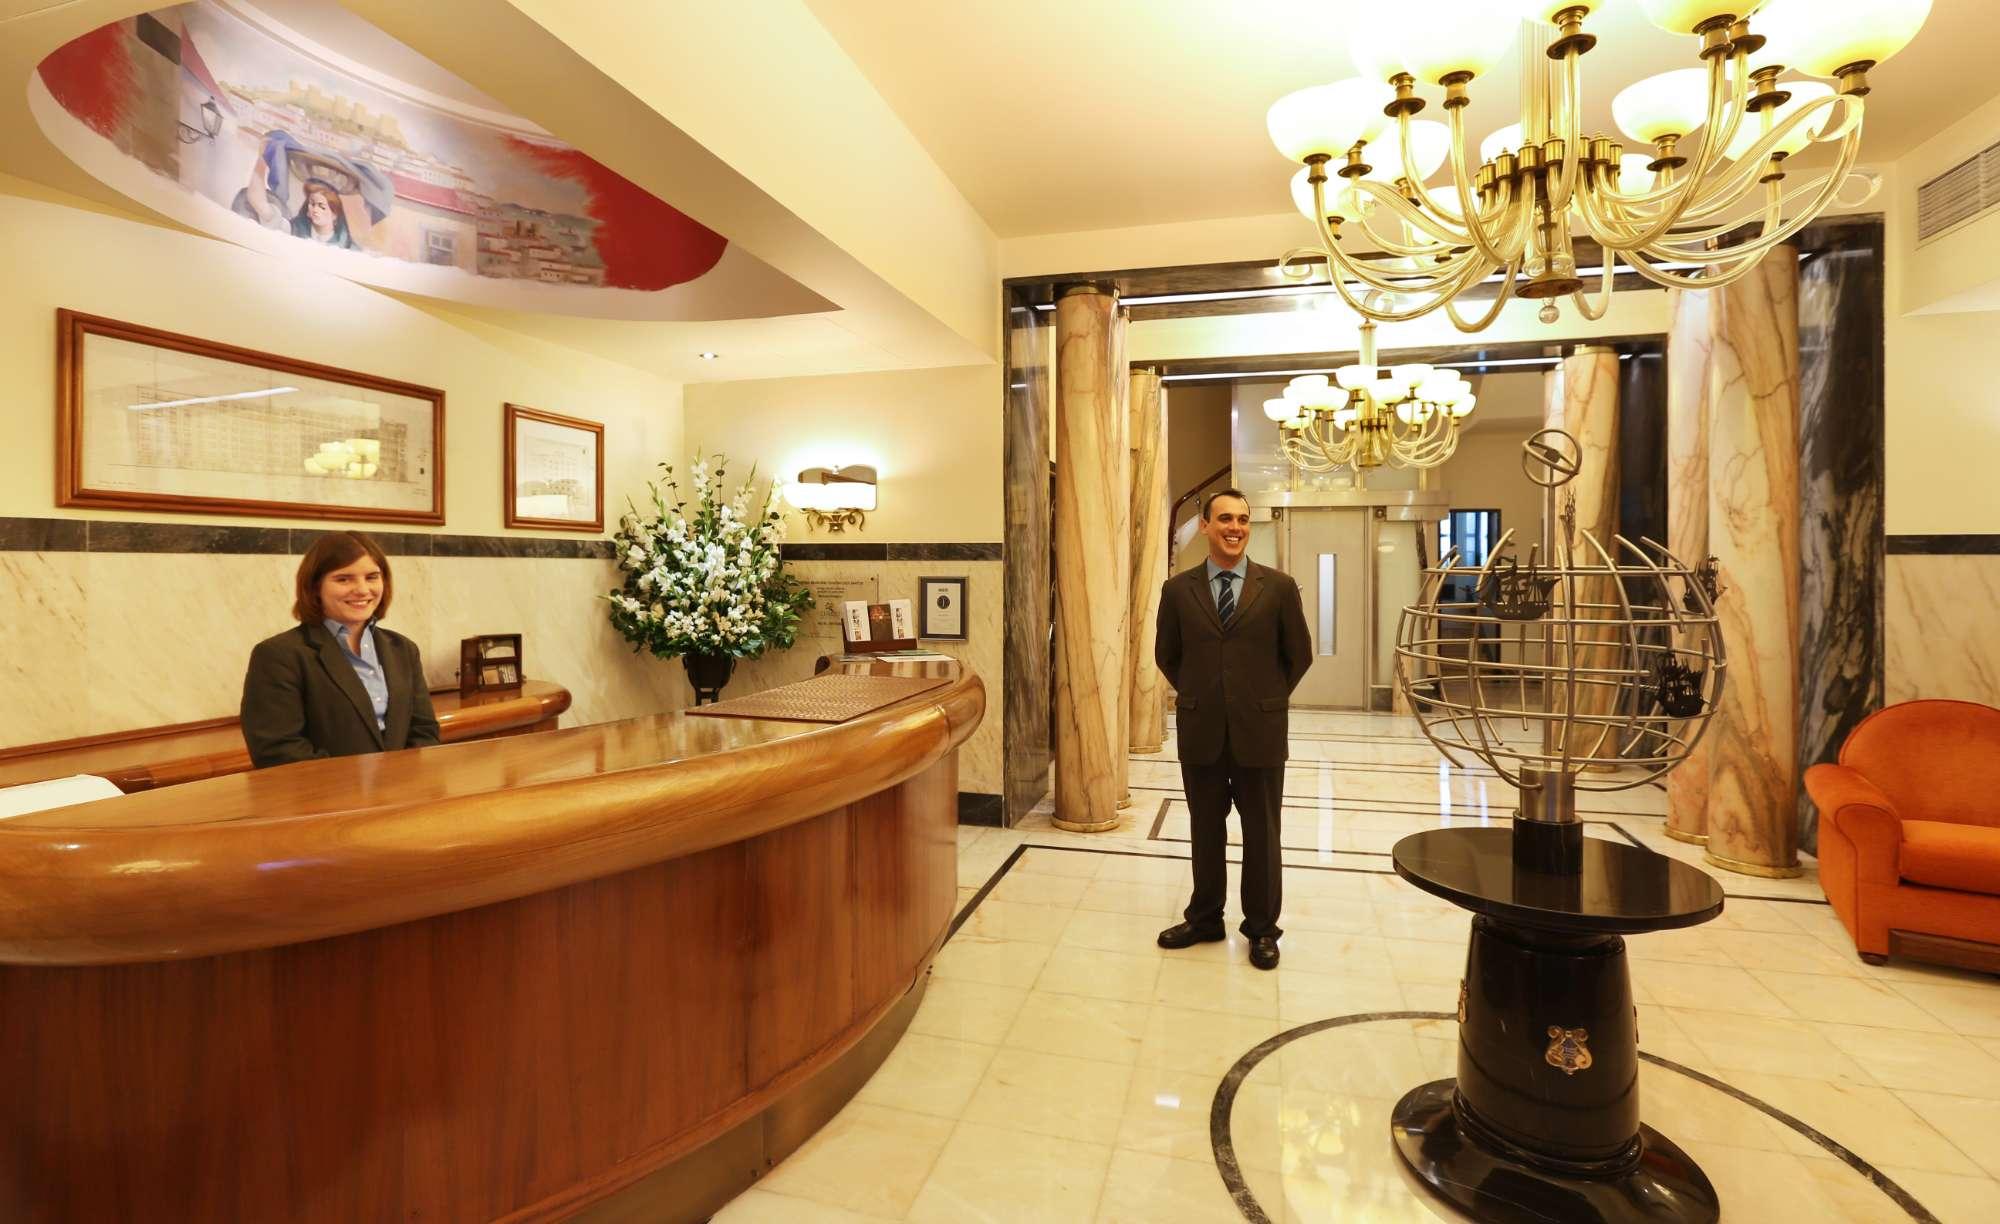 PF24268, Suite Residencial, Lisboa